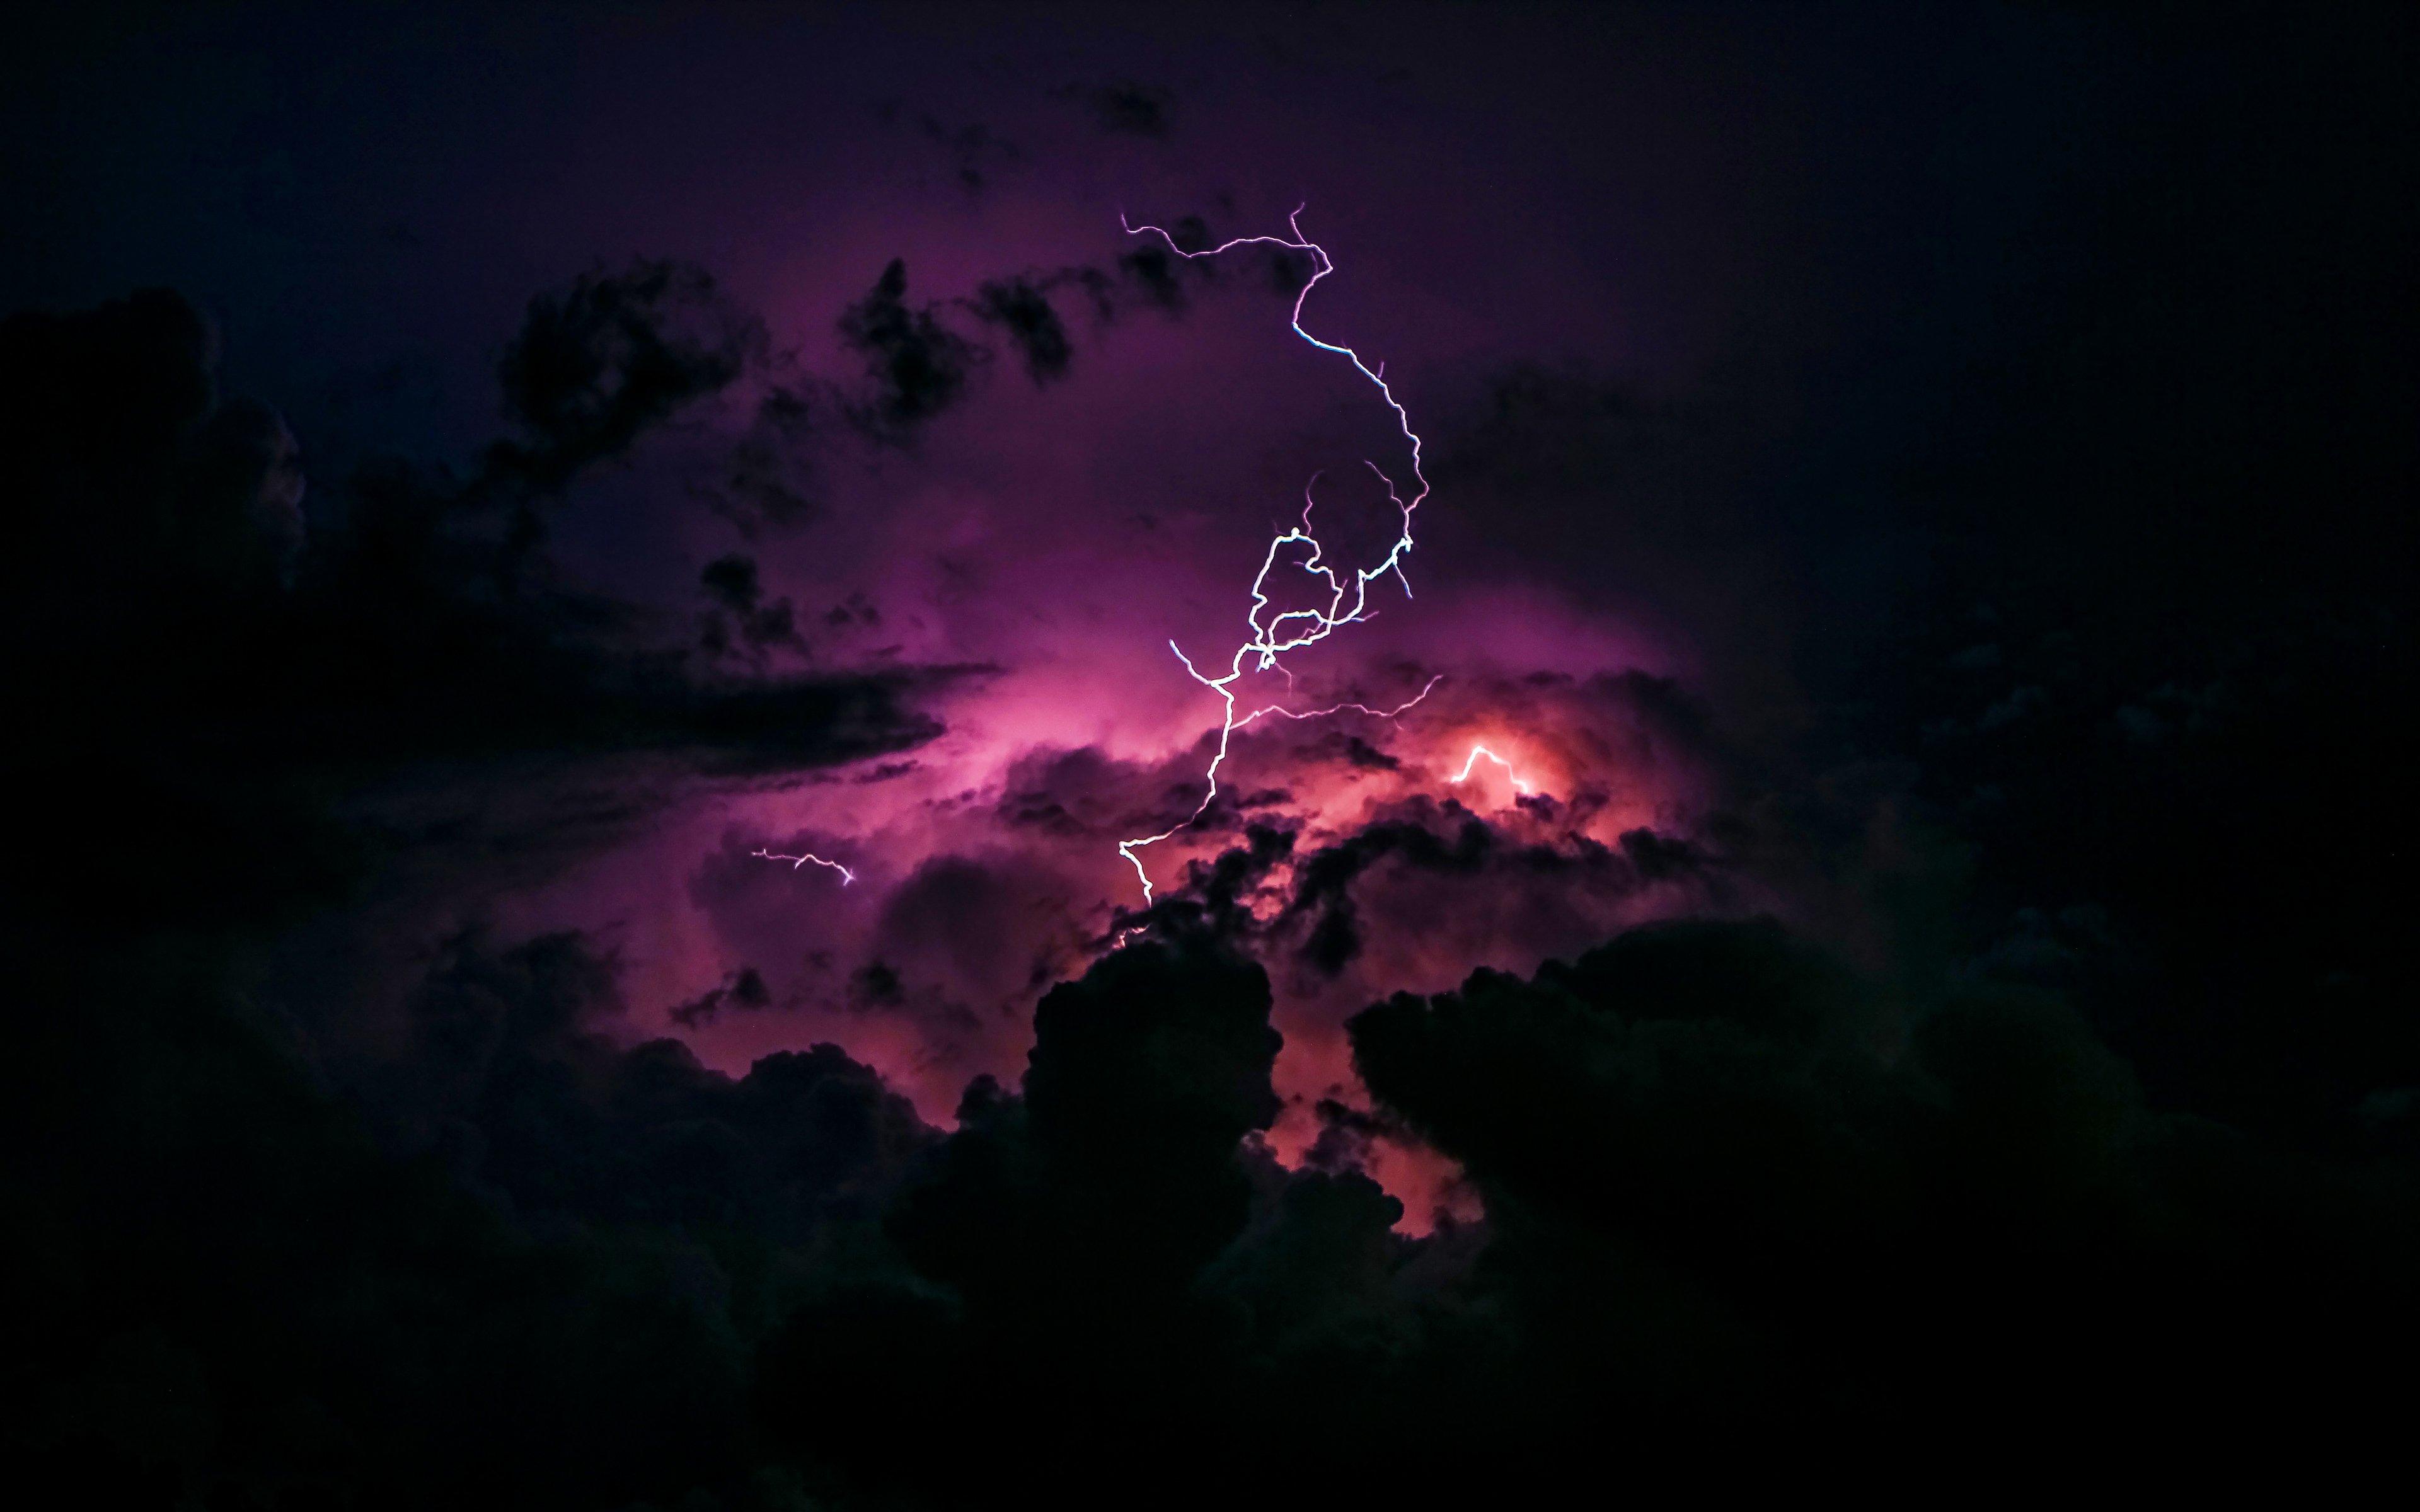 Thunderstorm Wallpaper 4k Ultra Hd Id 4051